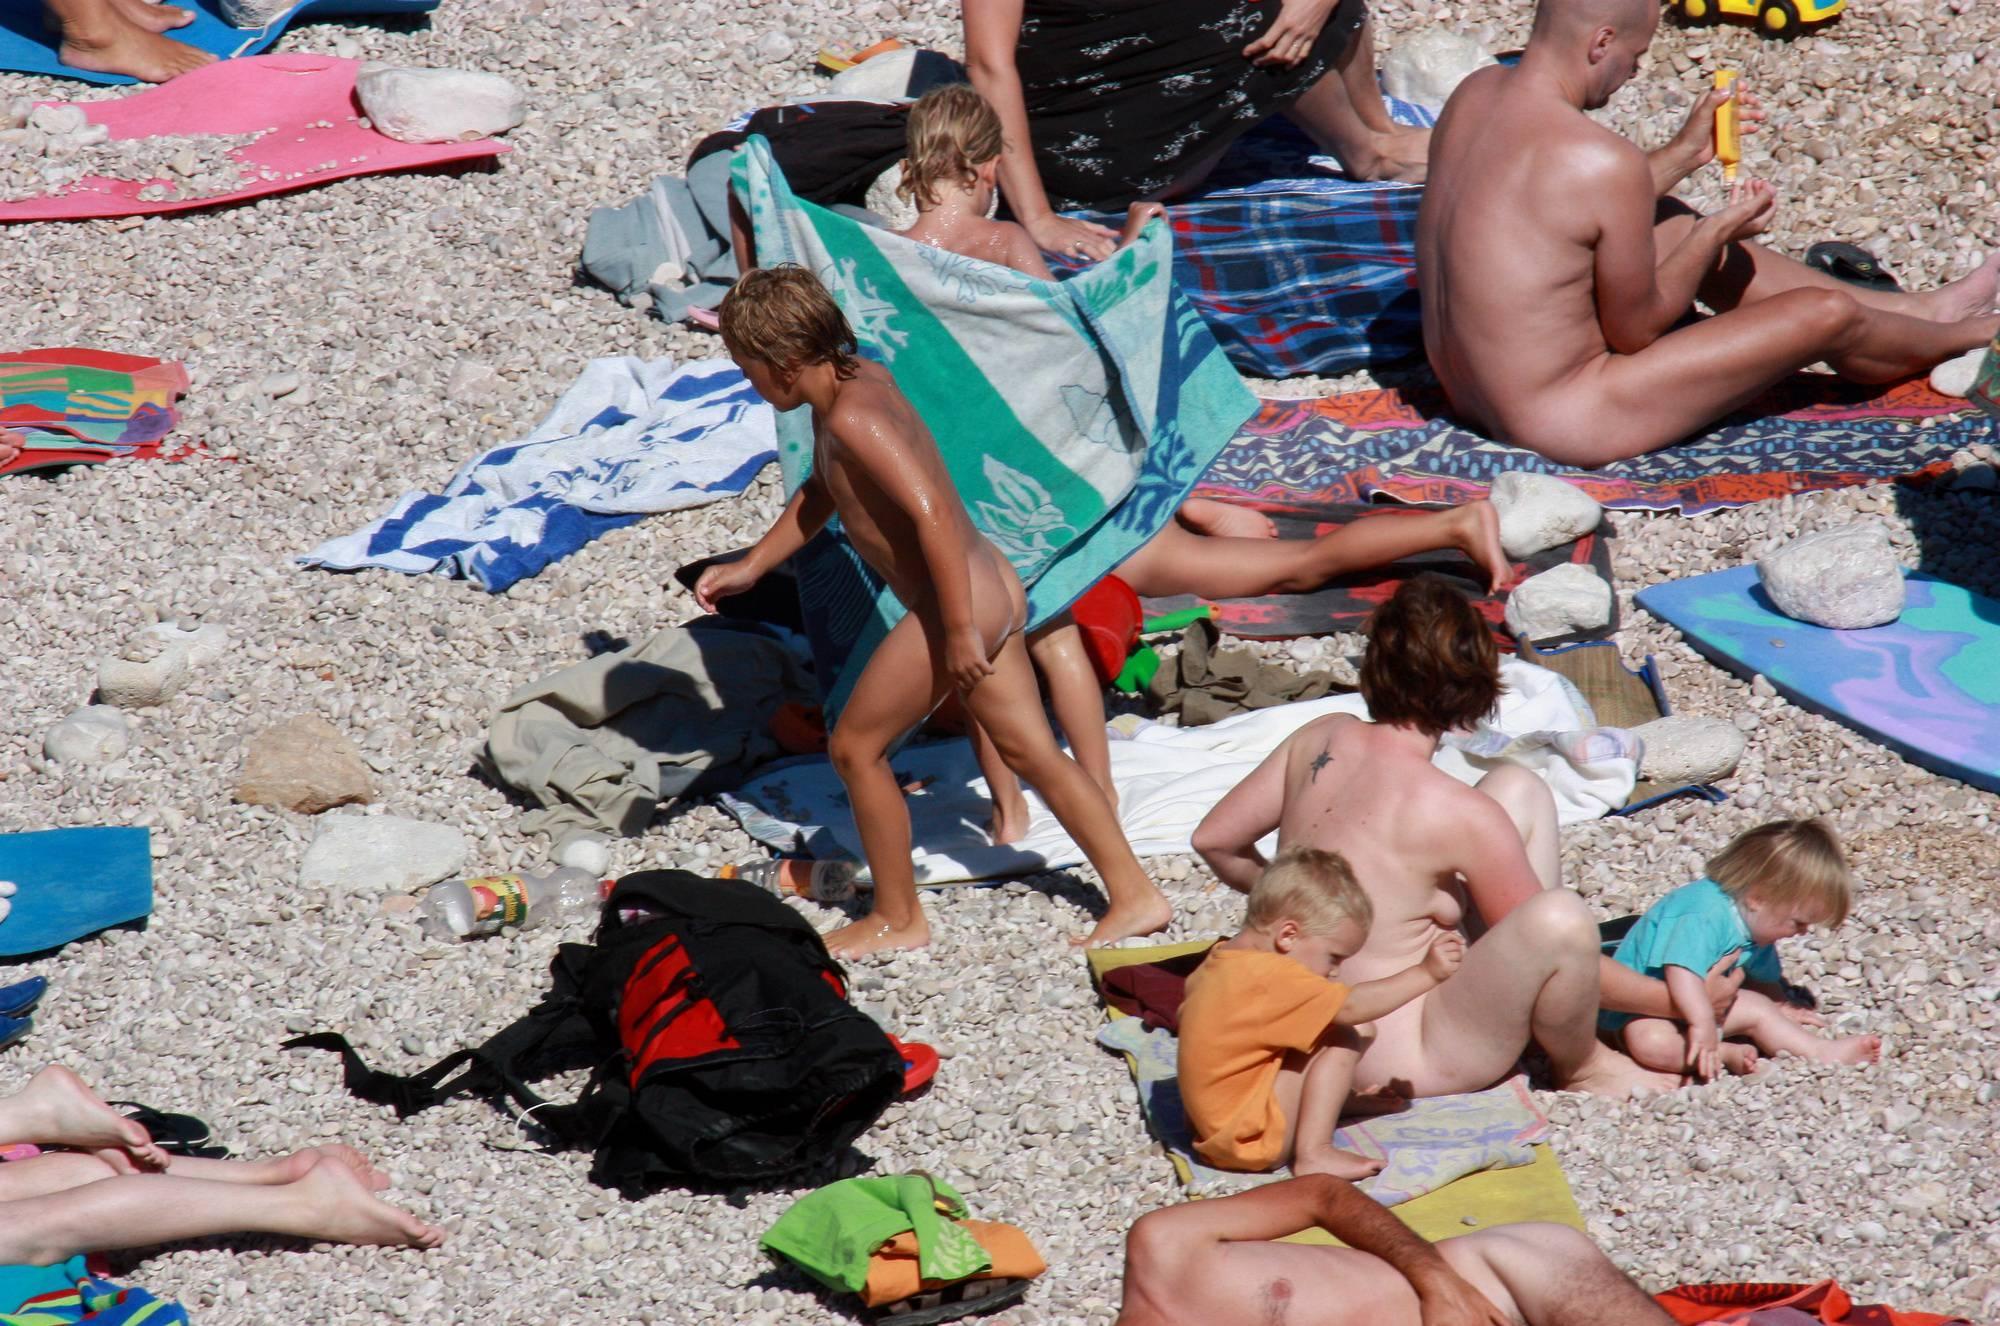 Nudist Family Beach Look - 4